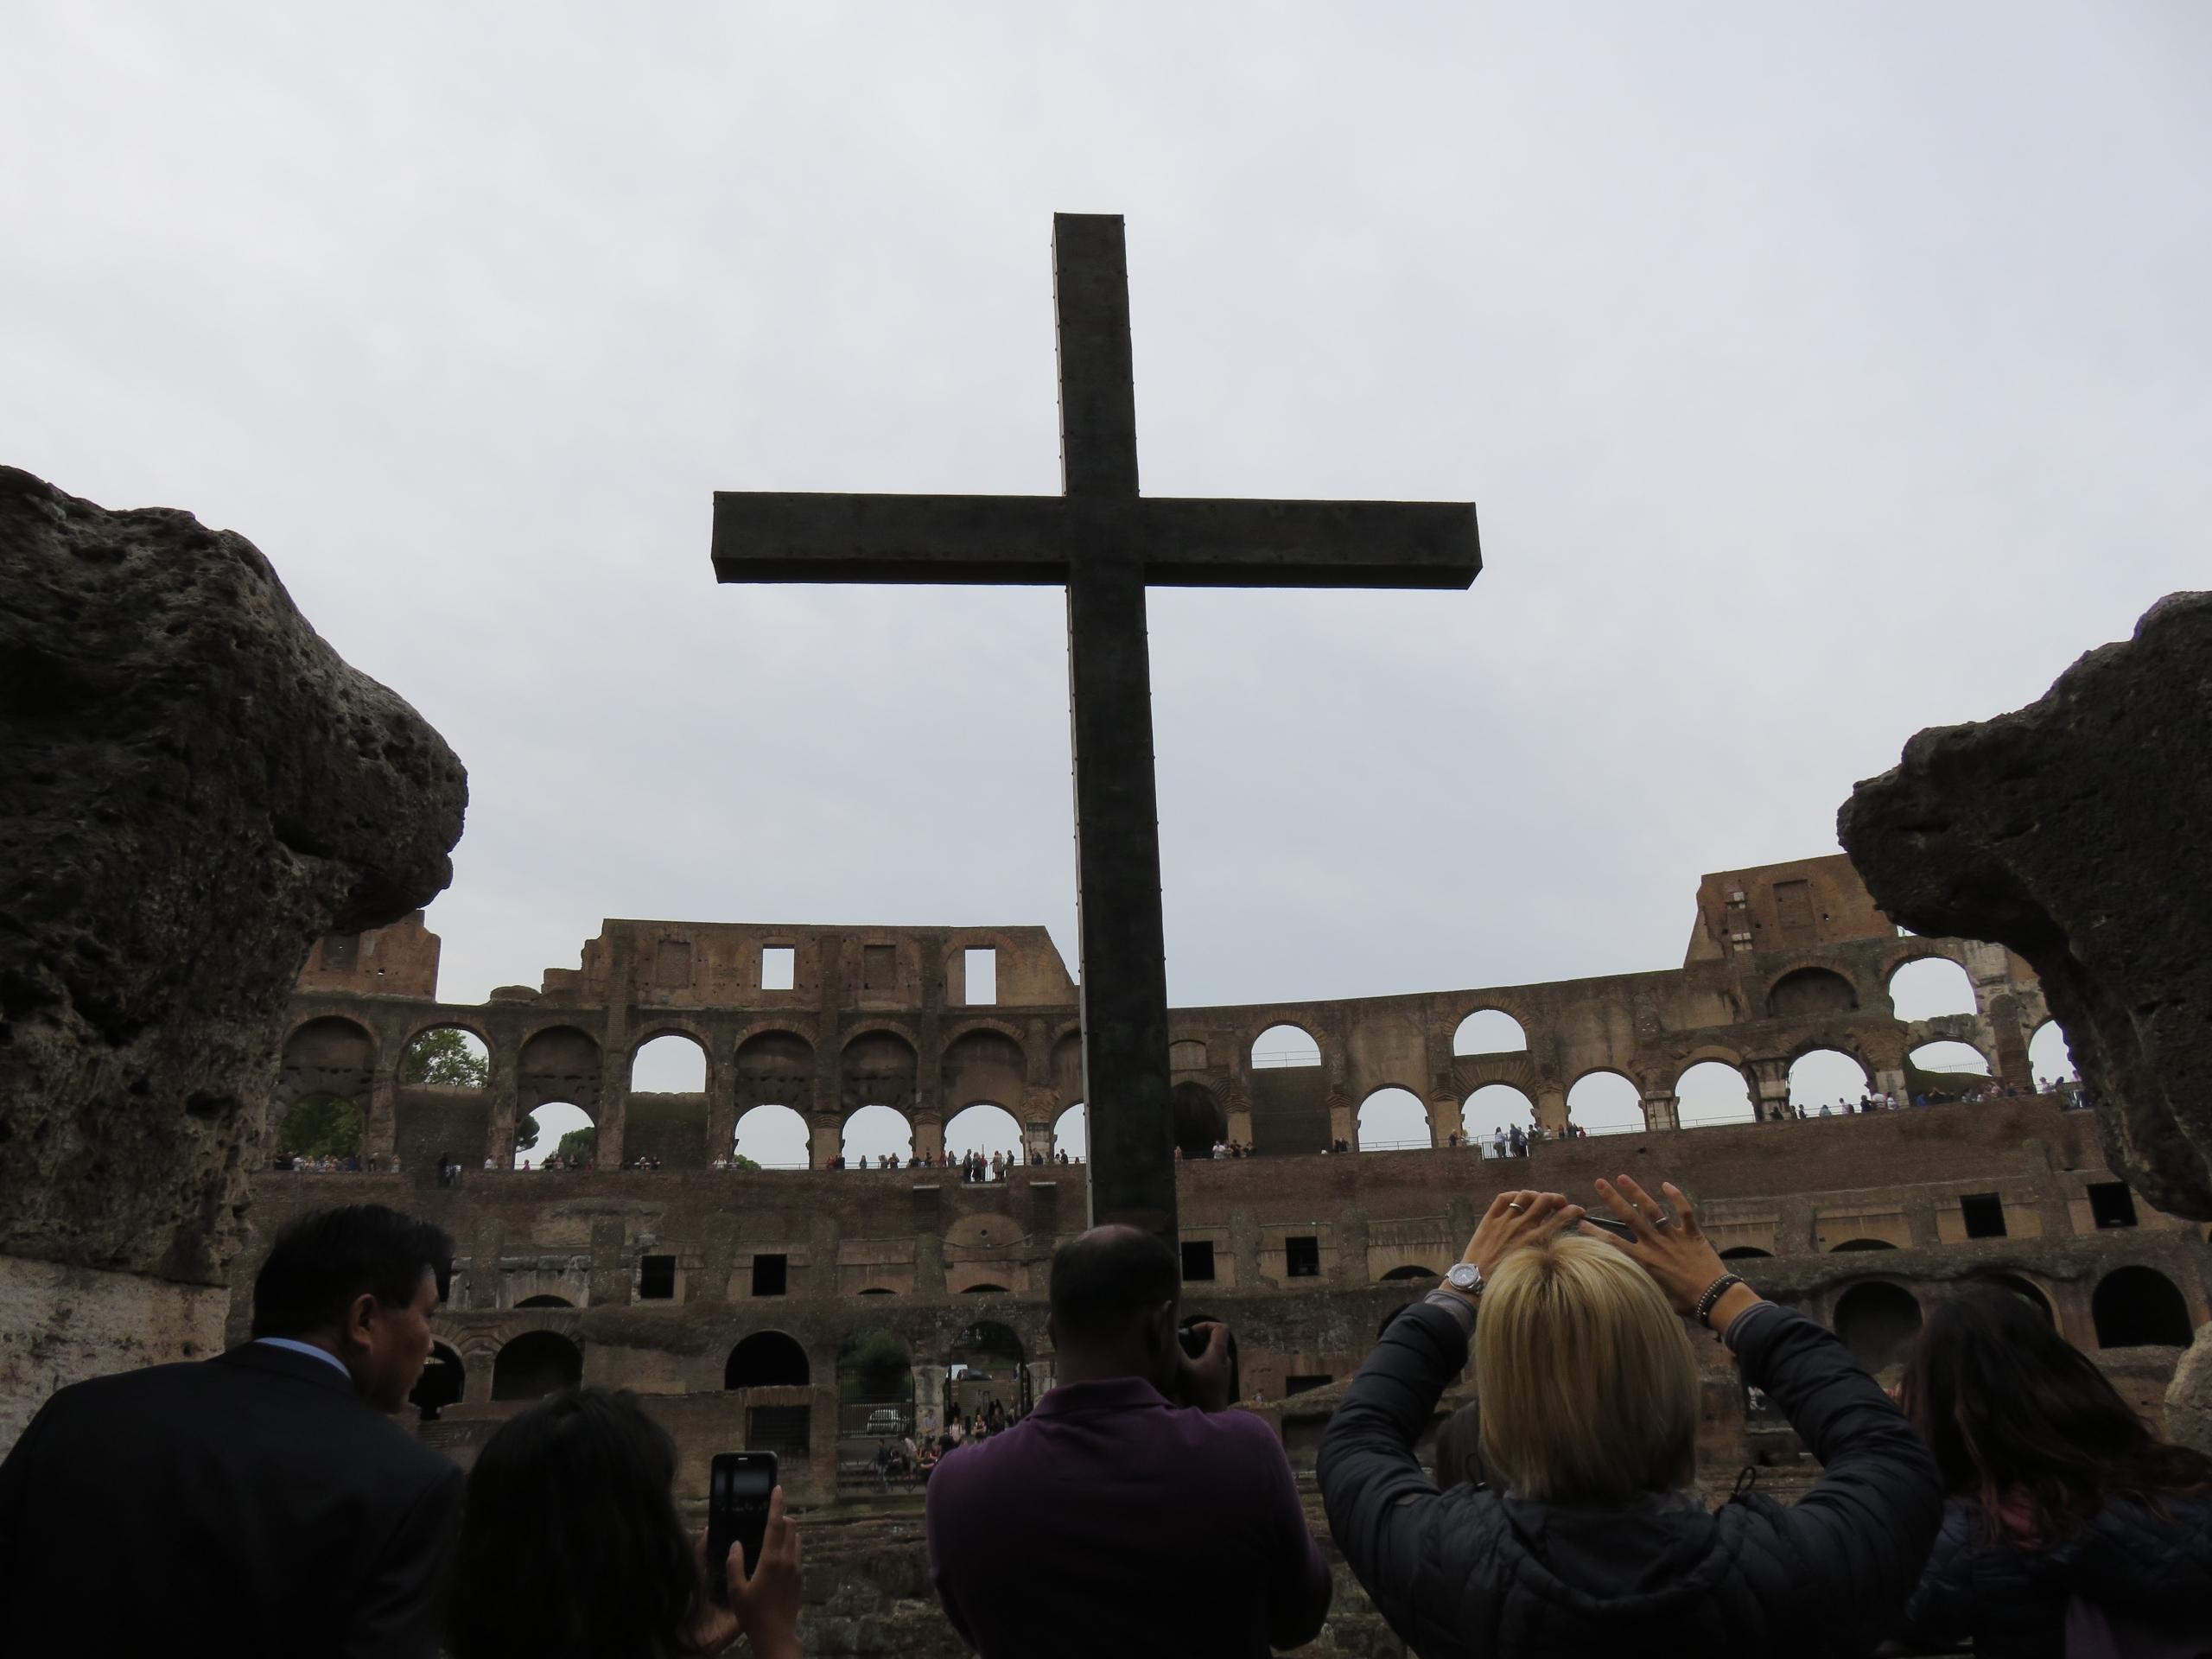 cross - Colosseum, Rome,, Italy. - sanftekuss | ello